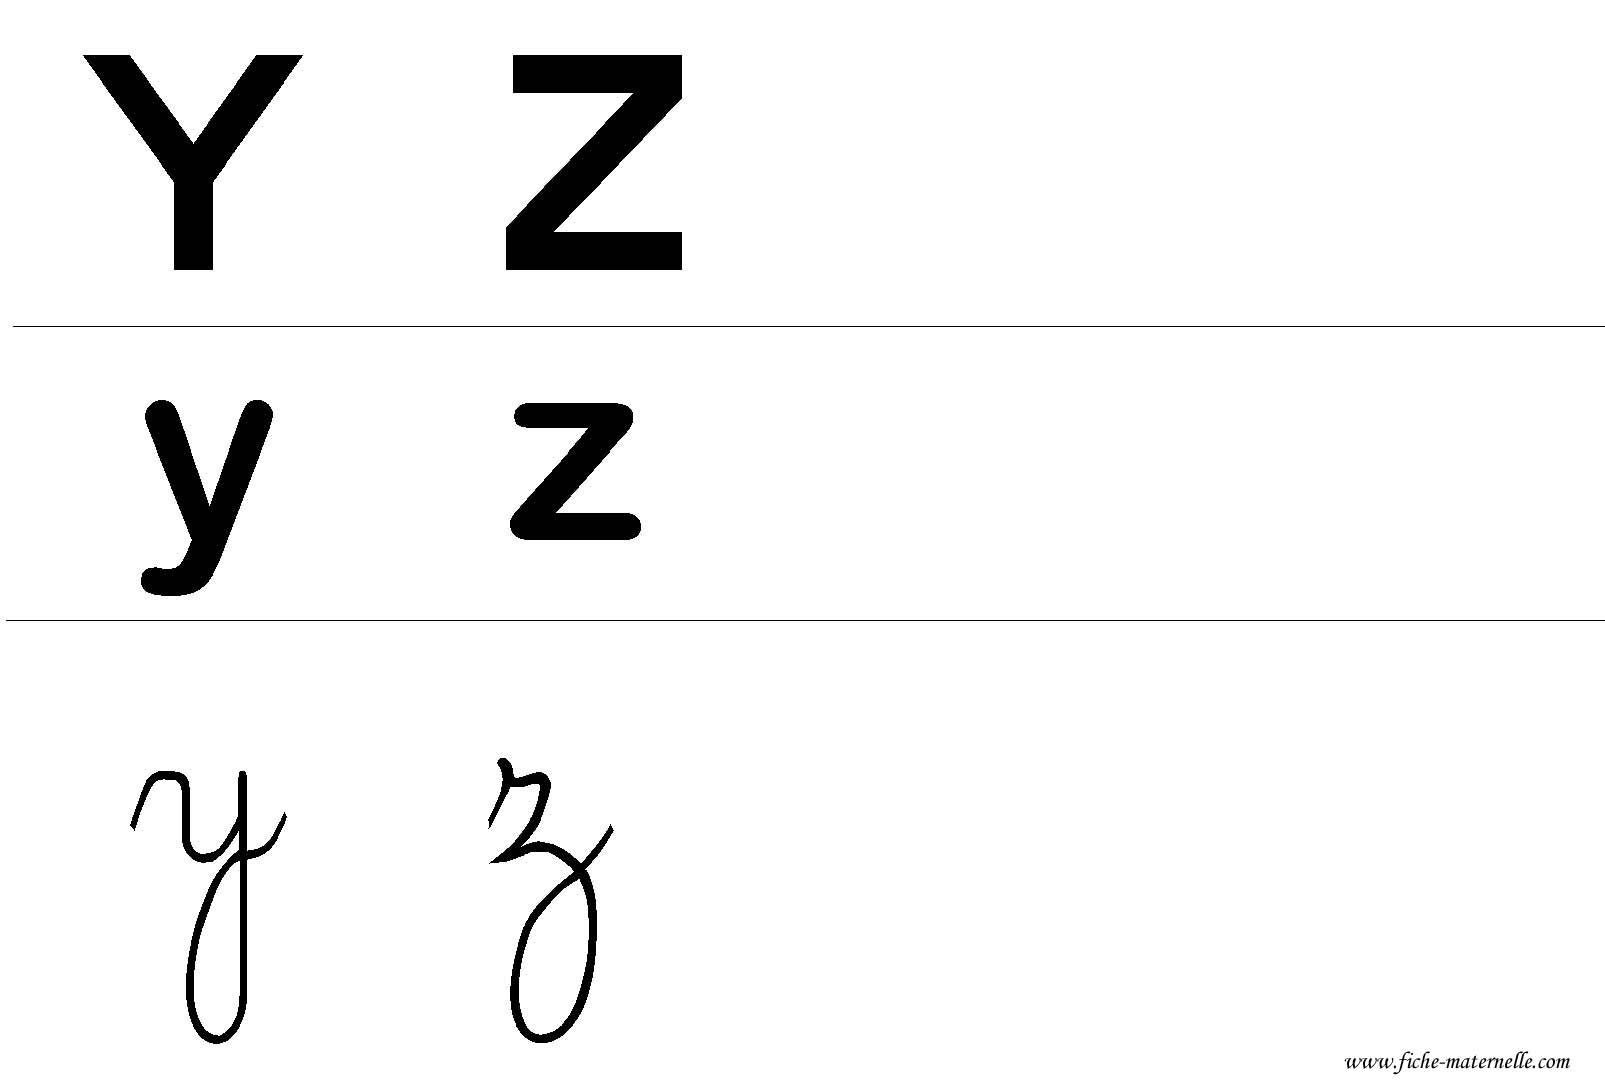 Alphabet Wallpapers  Full HD wallpaper search